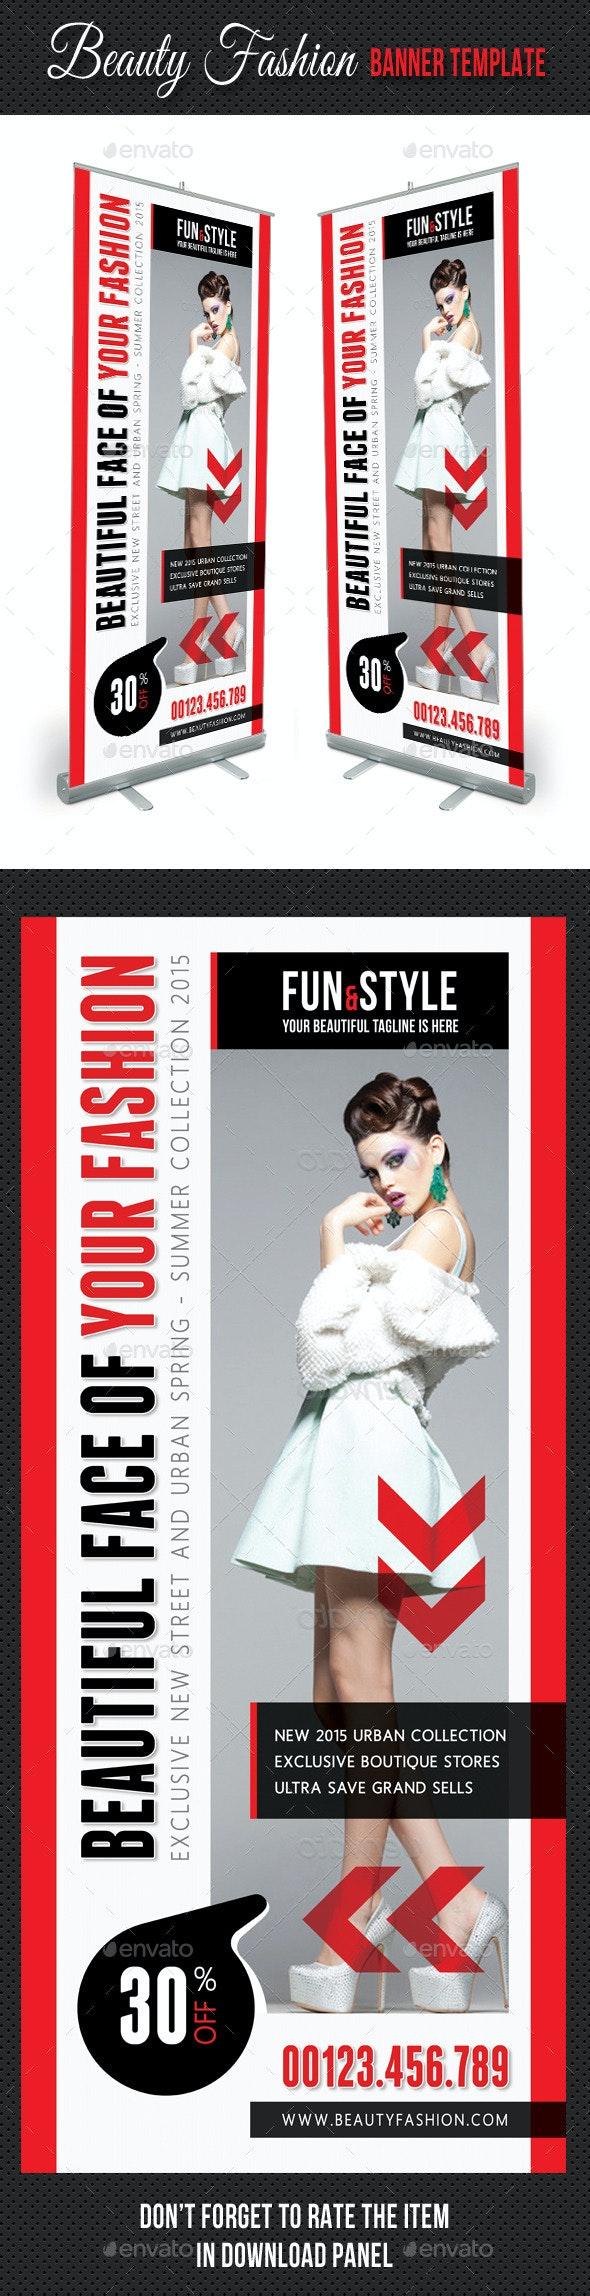 Beauty Fashion Banner Template V01